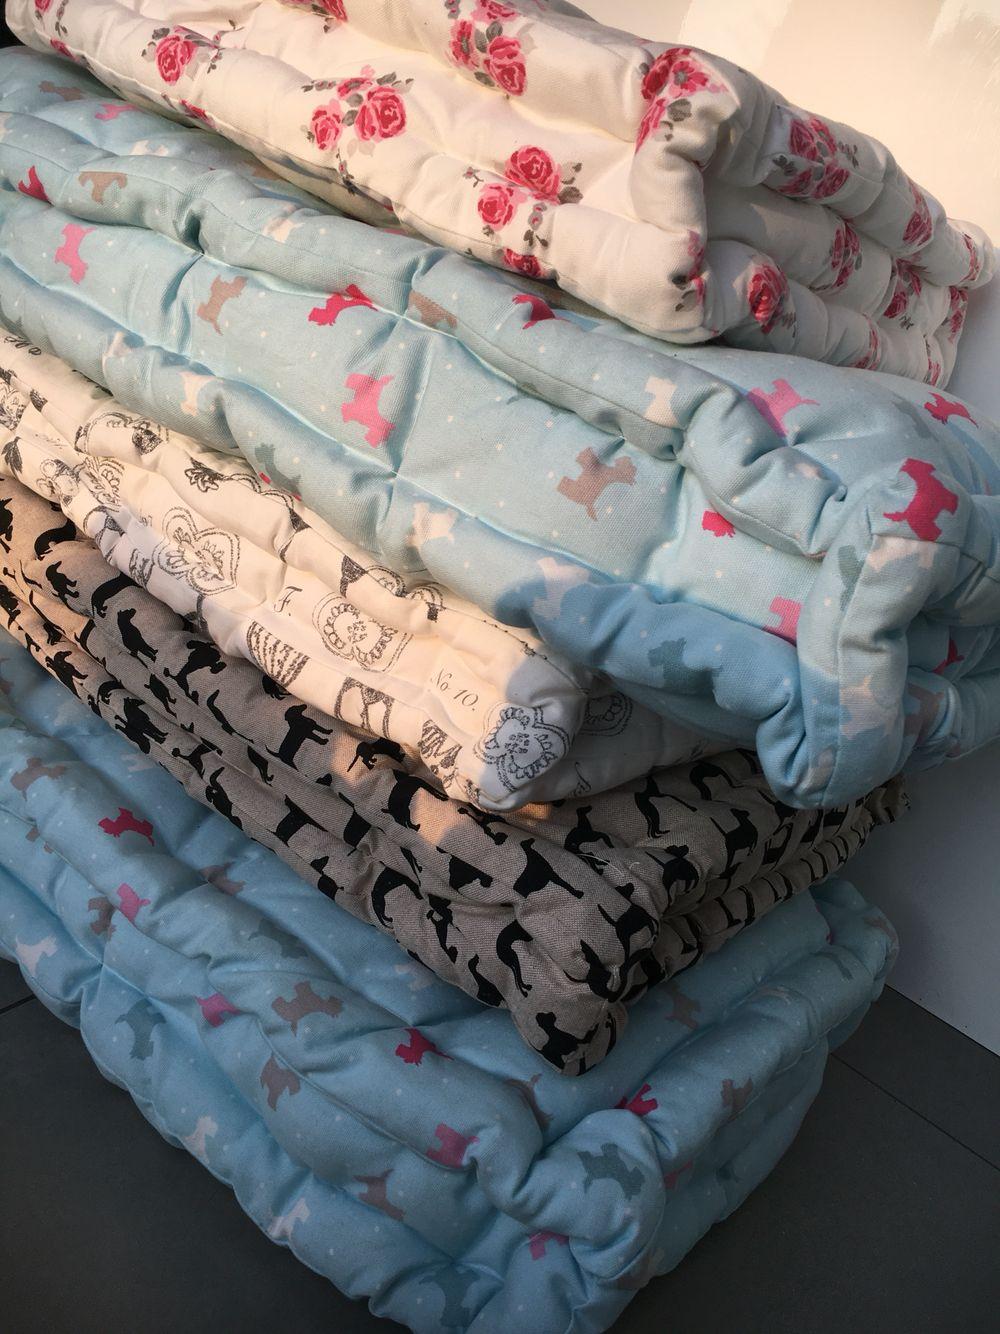 piled handmade quilted cushion mattresstufted cushion futon cushion knotting pillow quilt piled handmade quilted cushion mattresstufted cushion futon      rh   pinterest